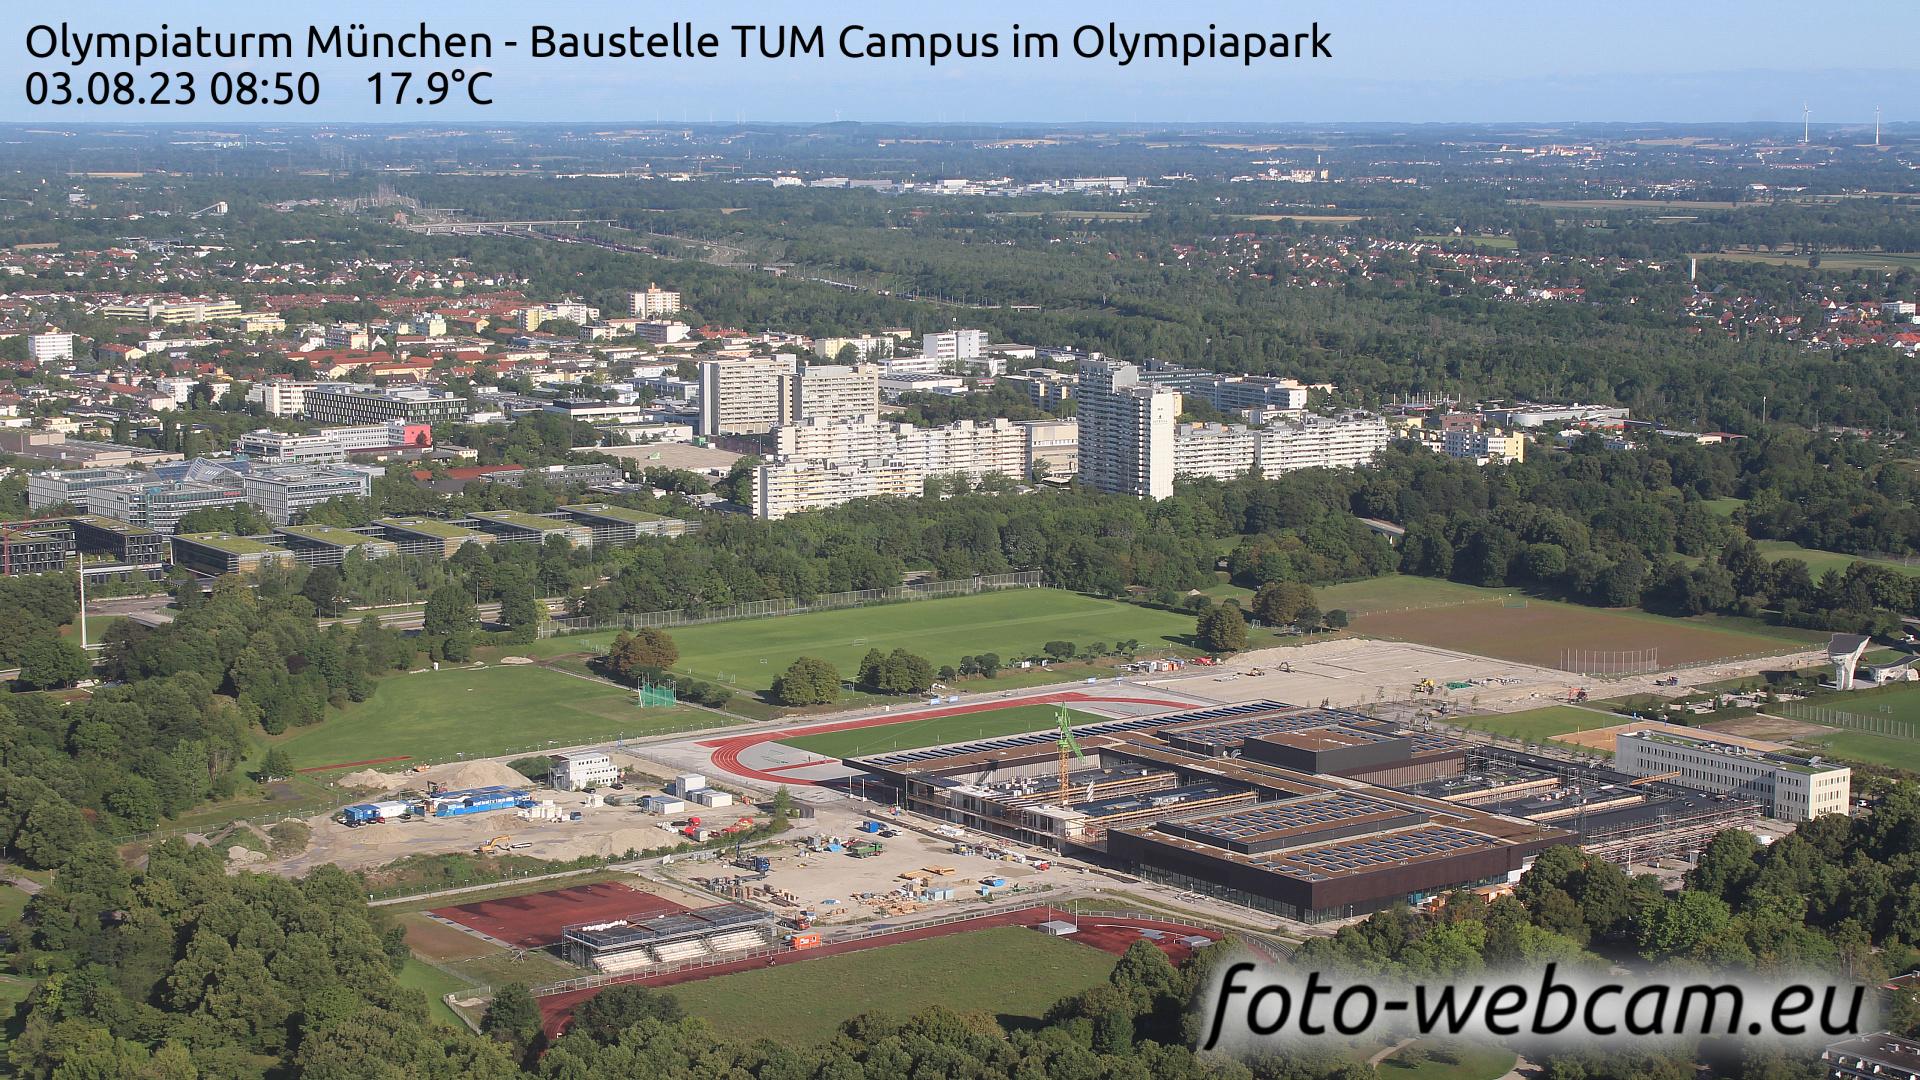 Munich Tue. 08:30